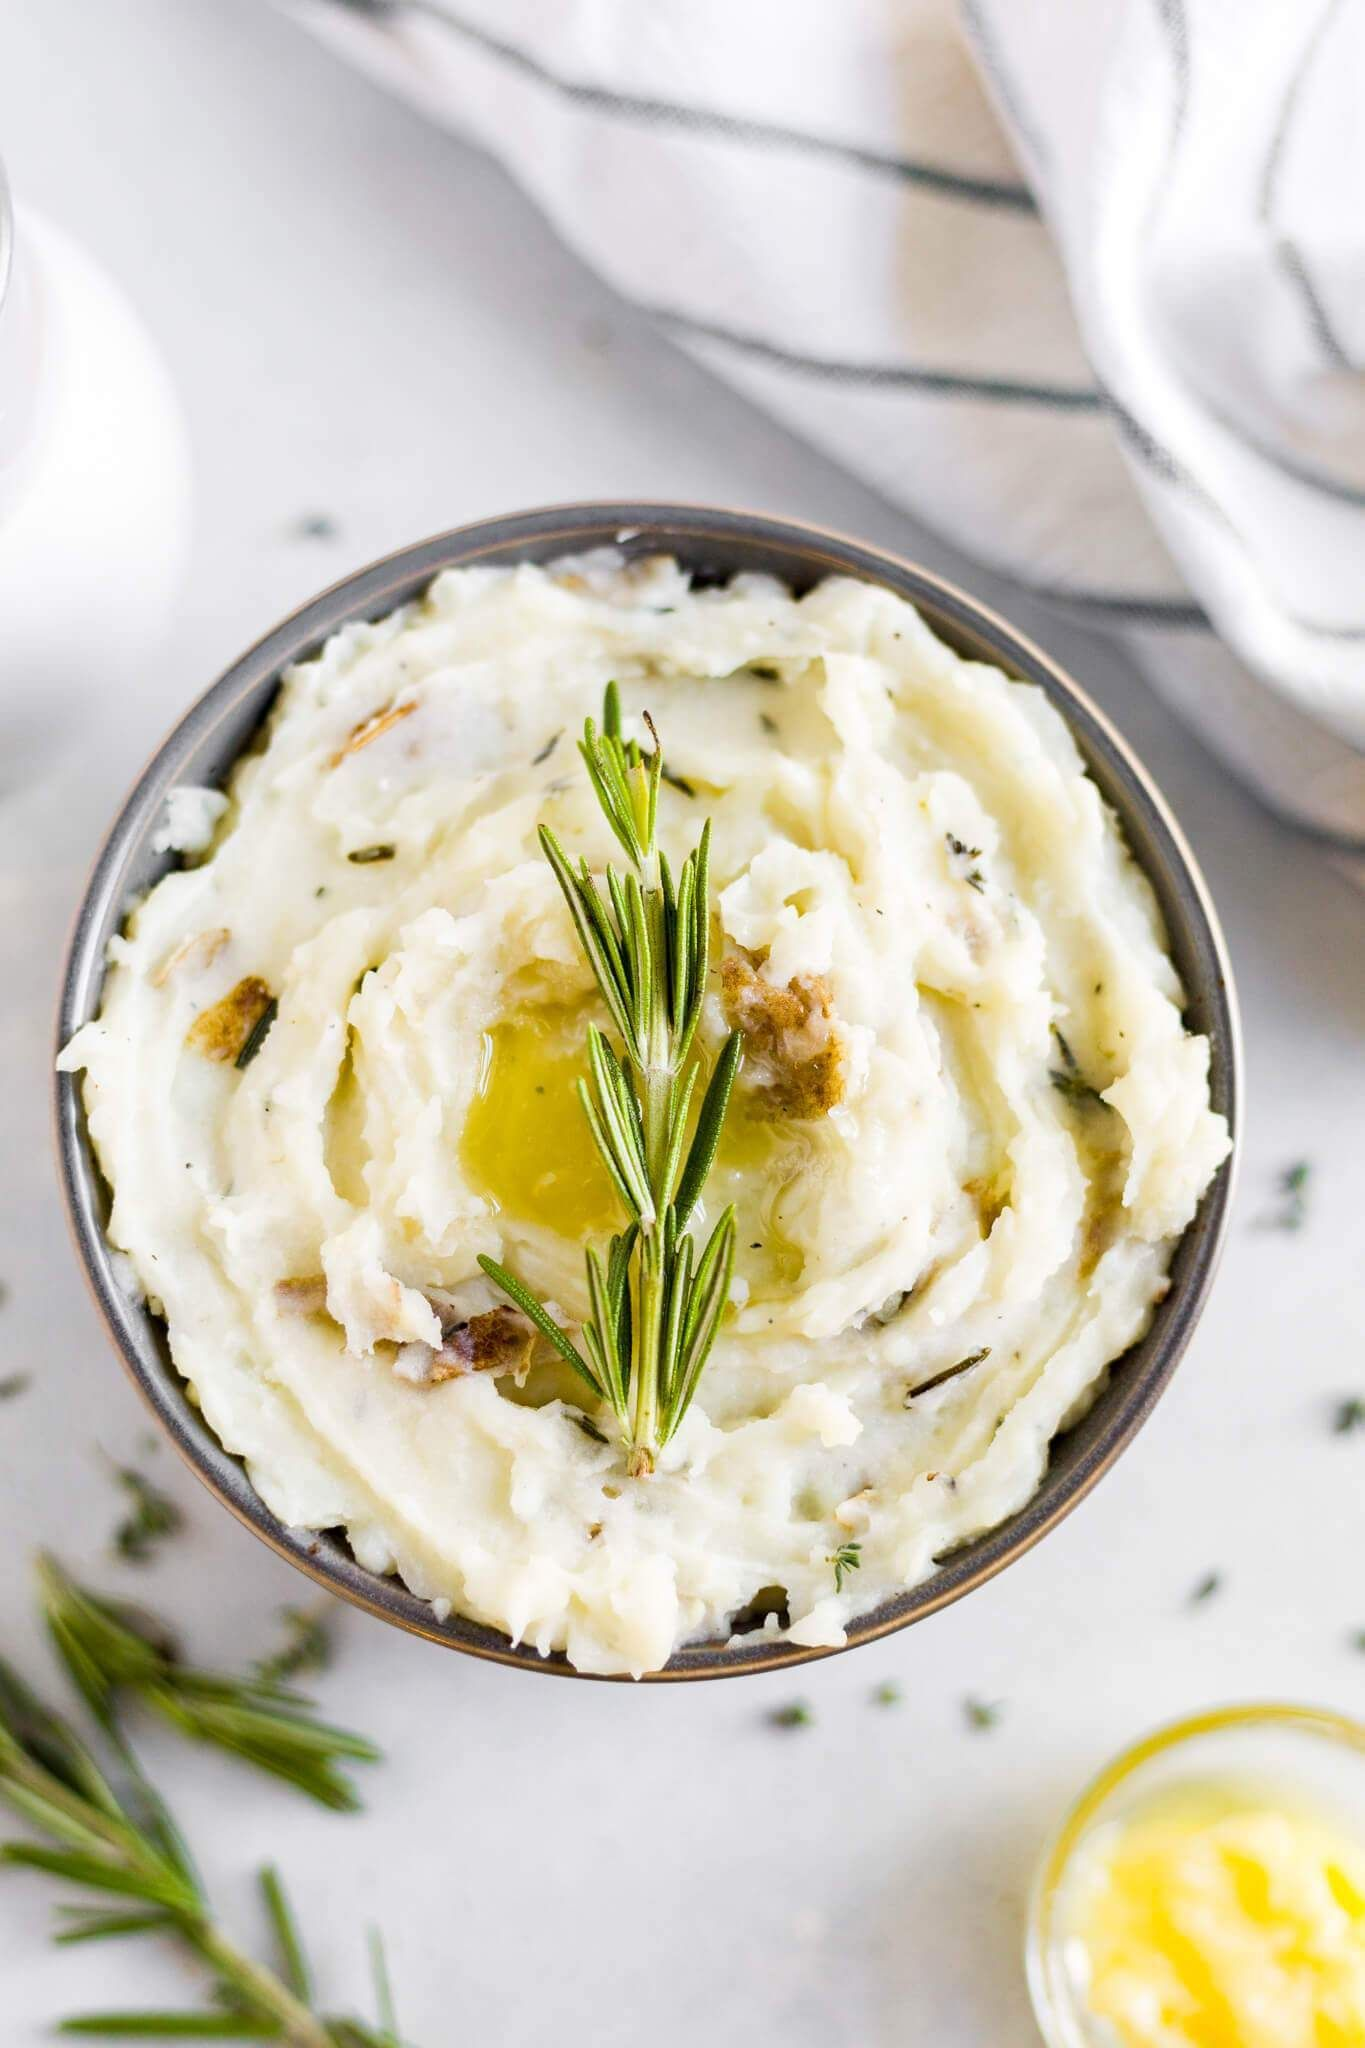 Best Dairy Free Mashed Potatoes #russetpotatorecipes